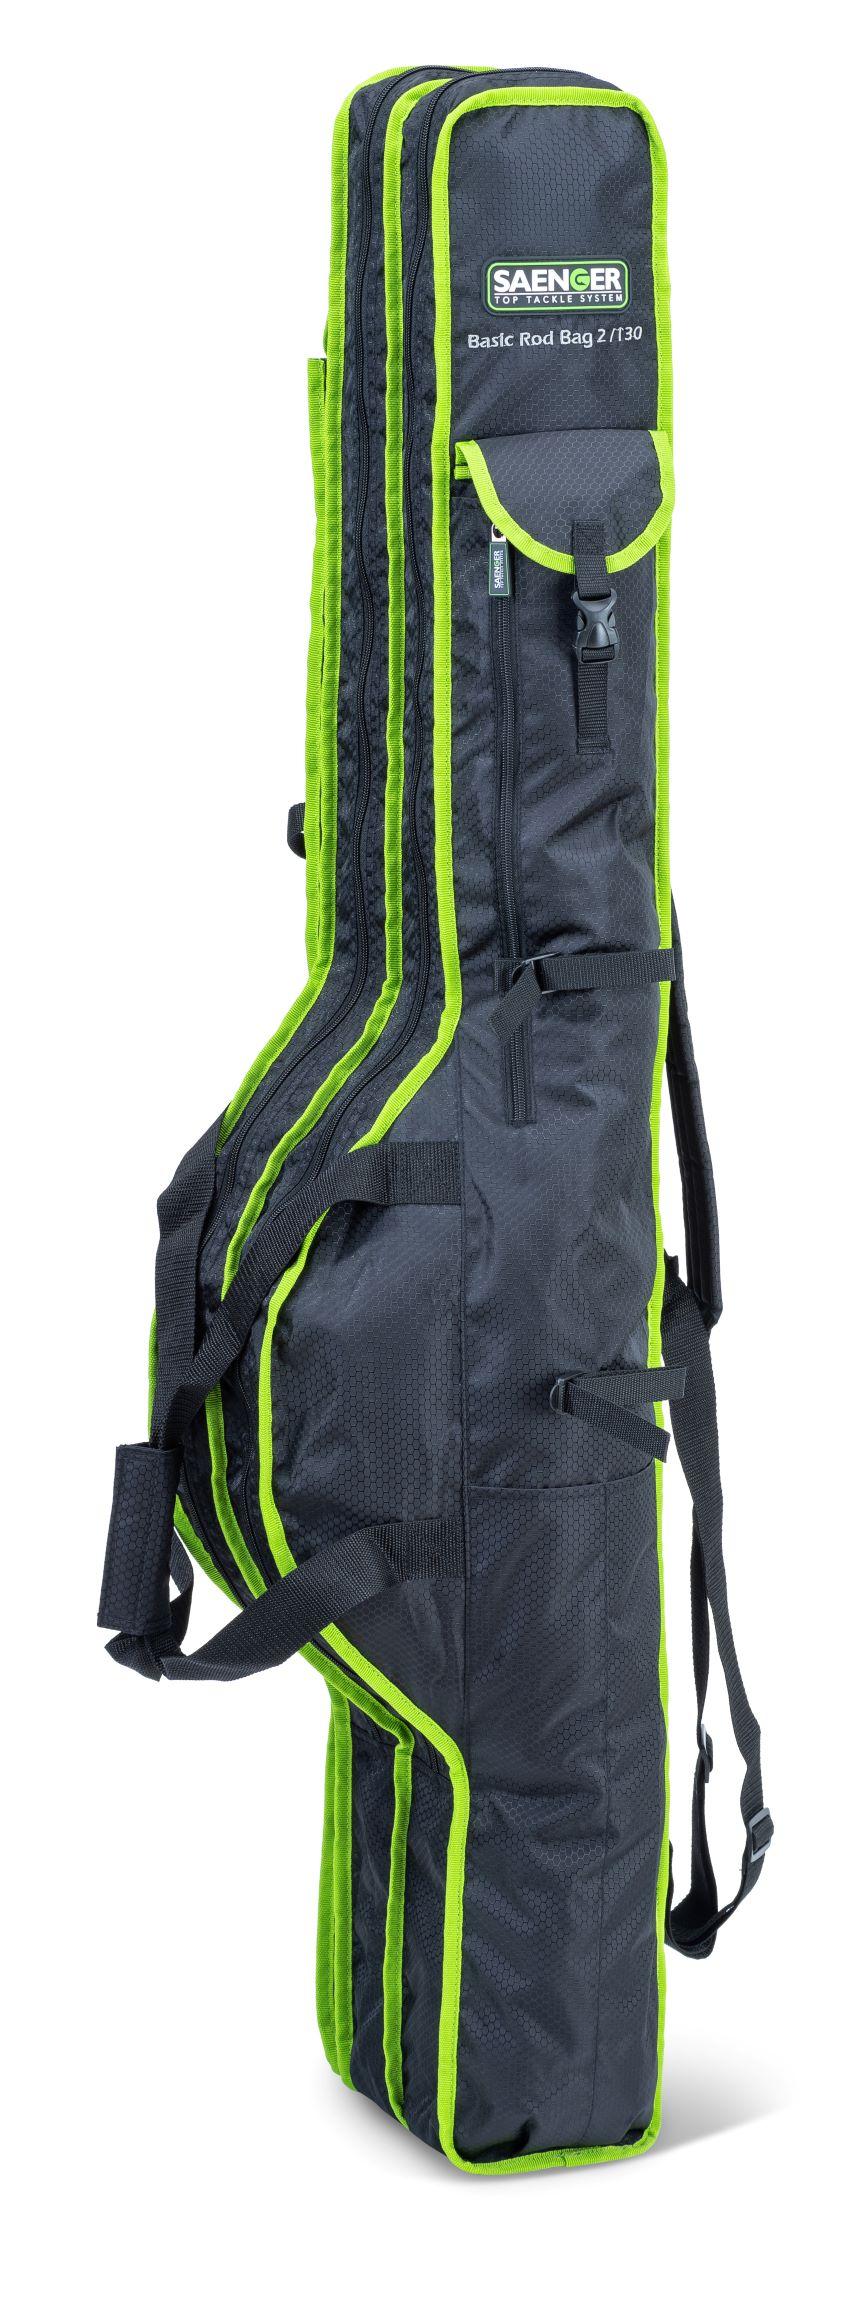 Saenger pouzdro na pruty Basic 2 Rod Bag 150